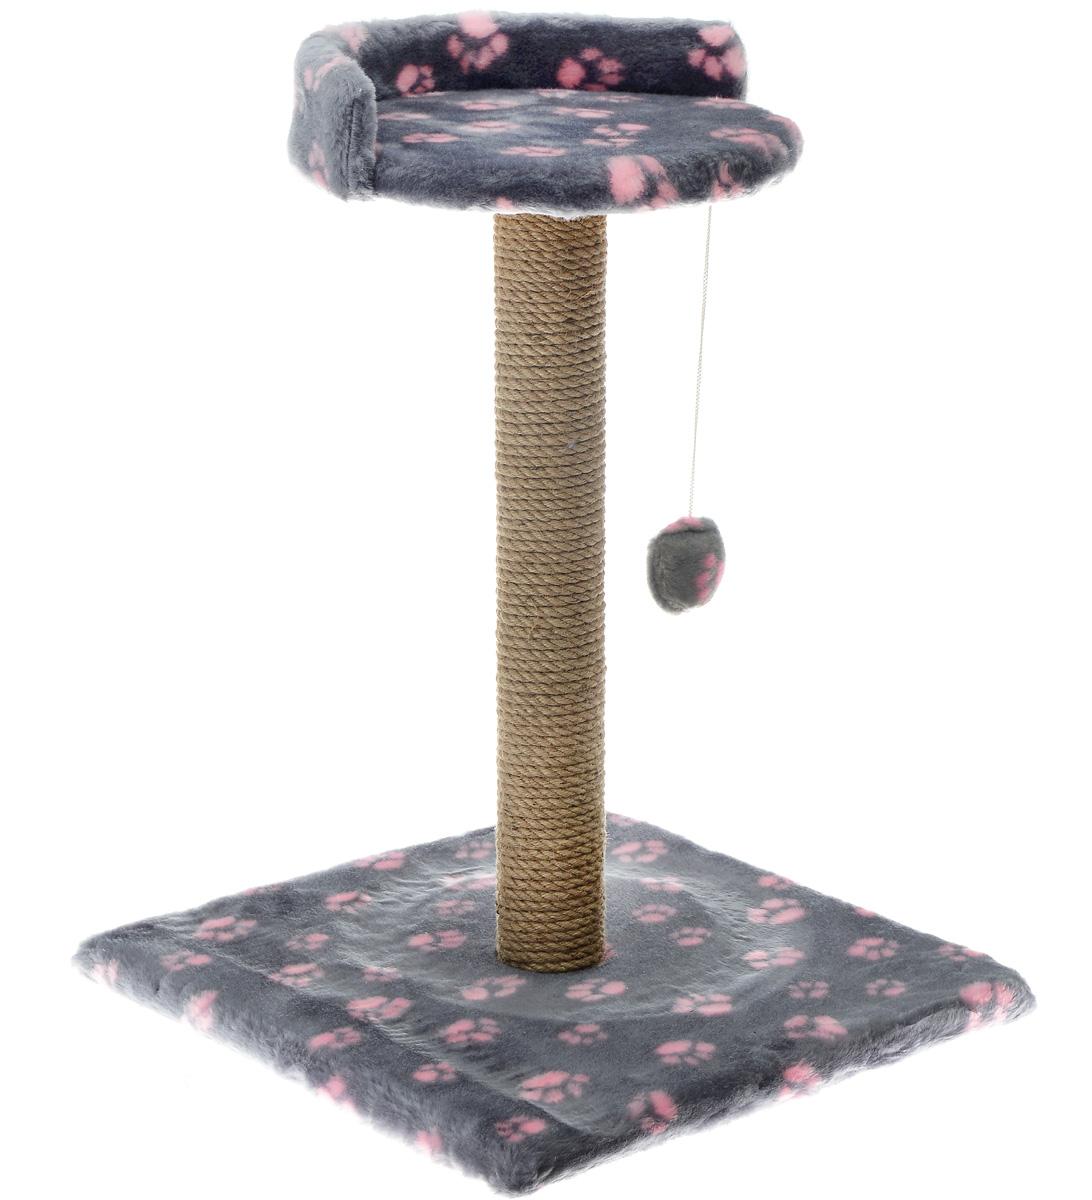 Когтеточка Меридиан Арена, цвет: темно-серый, розовый, 41 х 41 х 59 см